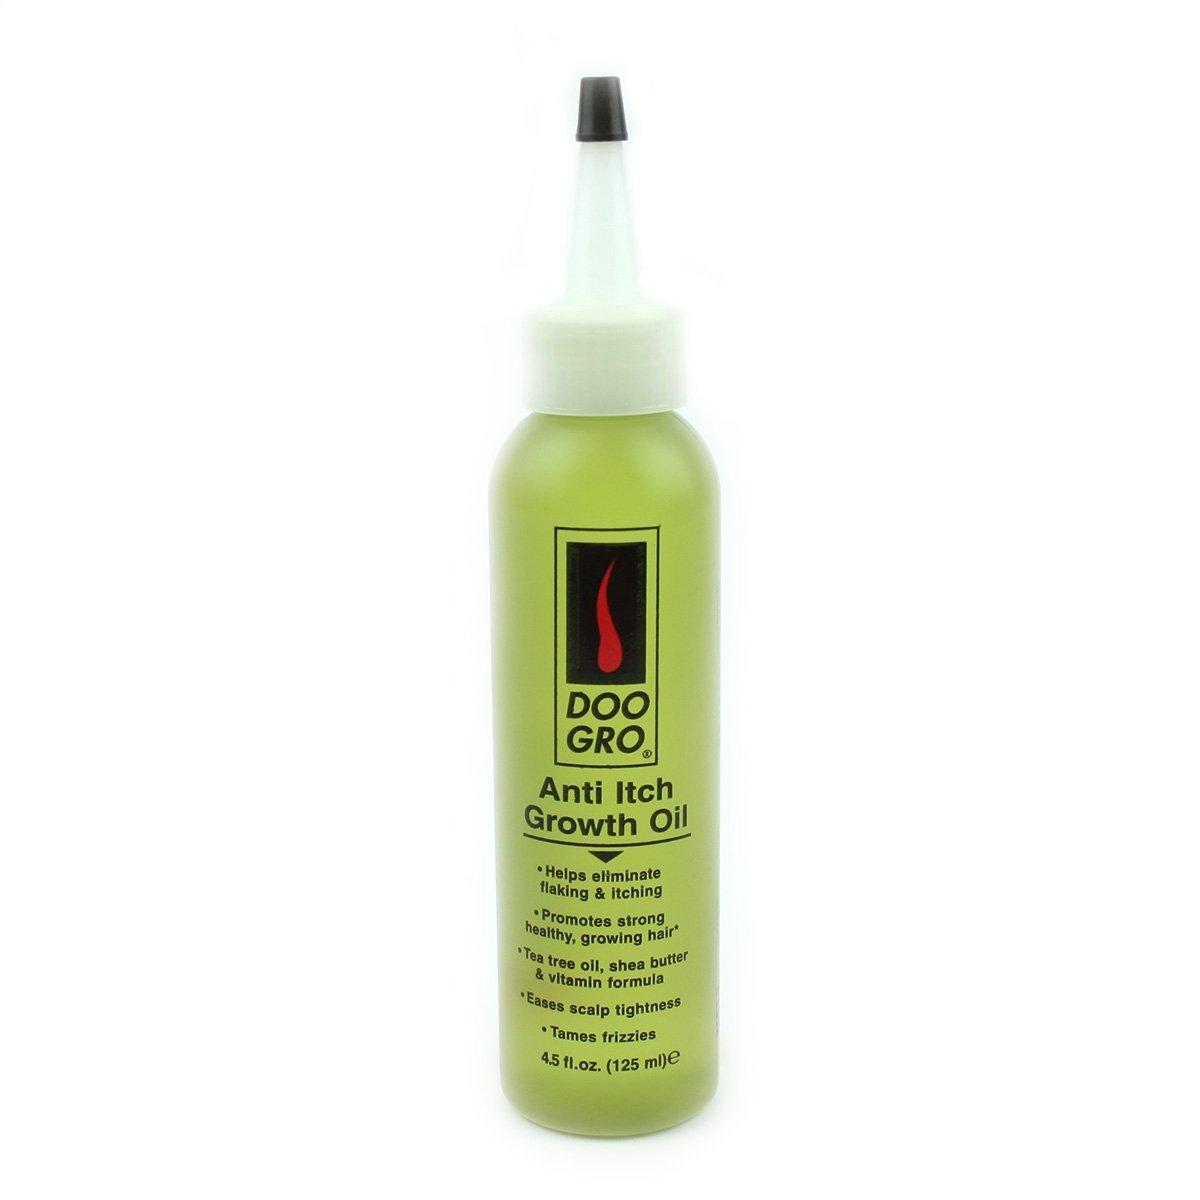 DOO GRO Anti-Itch Growth Oil, 4.5 oz